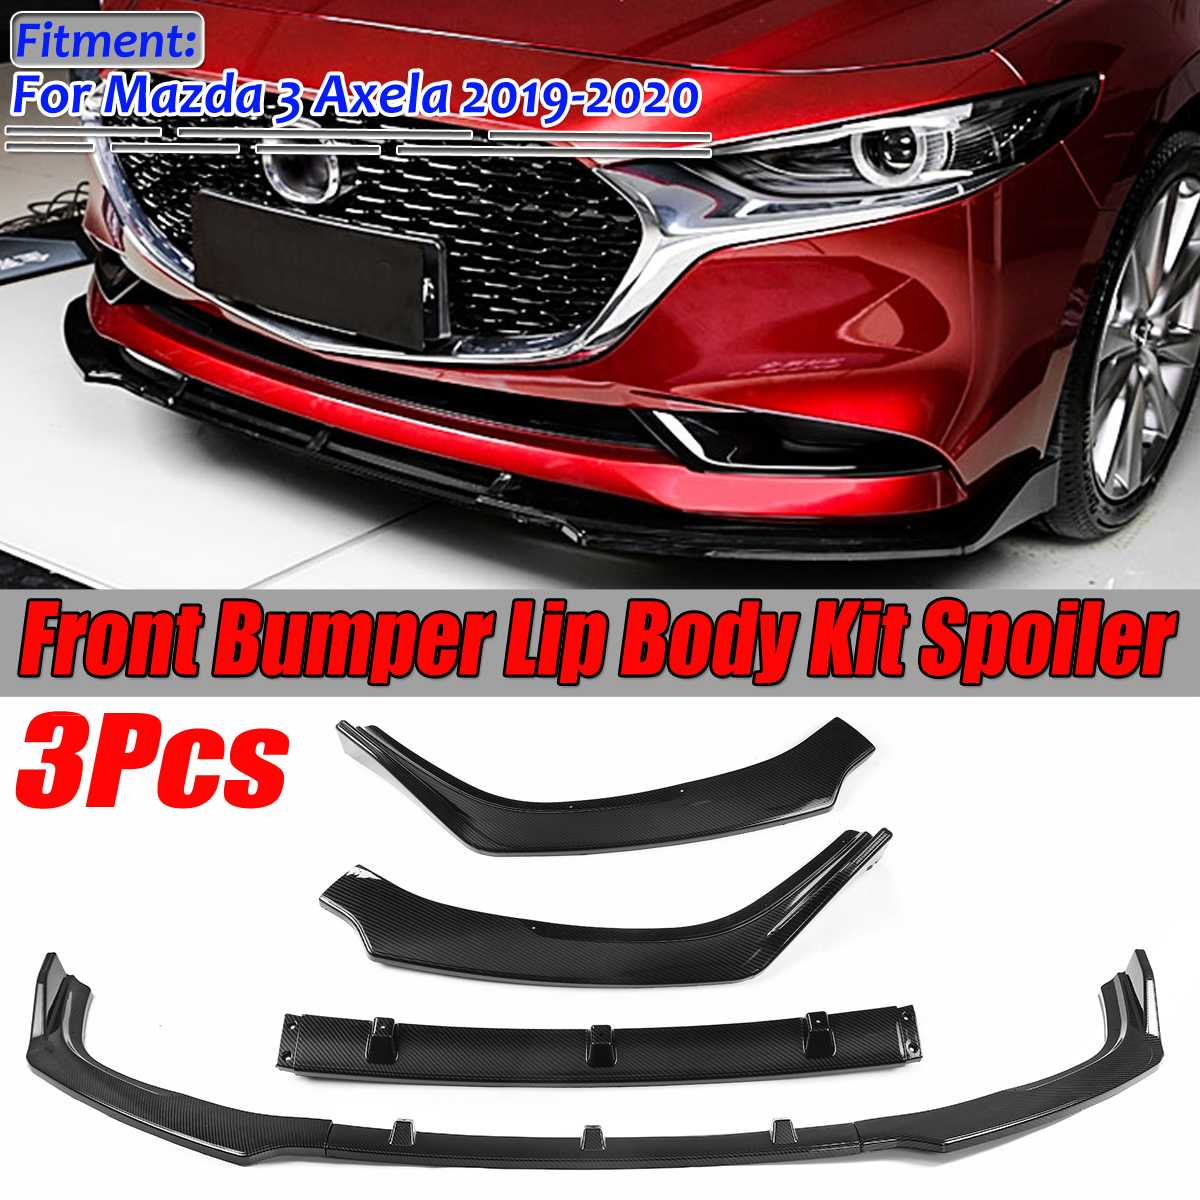 New Carbon Fiber Look/Black Car Front Bumper Splitter Lip Spoiler Diffuser Guard Cover Trim Body Kit For Mazda 3 Axela 2019-2020